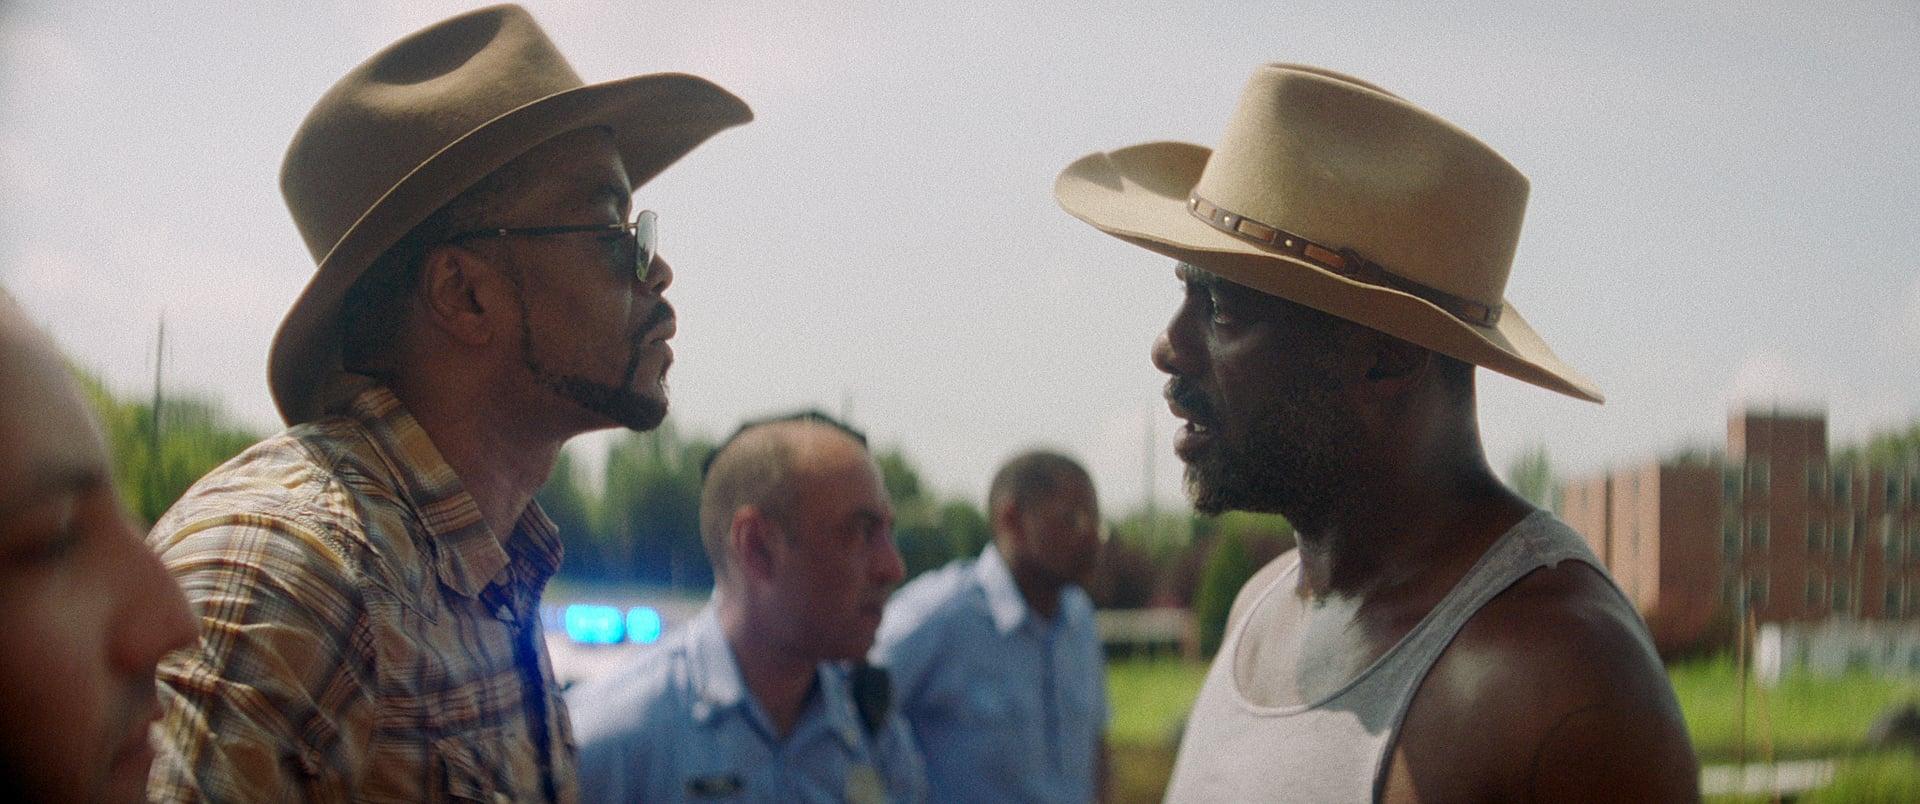 Photos From Netflix's Concrete Cowboy | Caleb McLaughlin and Idris Elba  Saddle Up For Intense Father-Son Drama Concrete Cowboy | POPSUGAR  Entertainment Photo 3